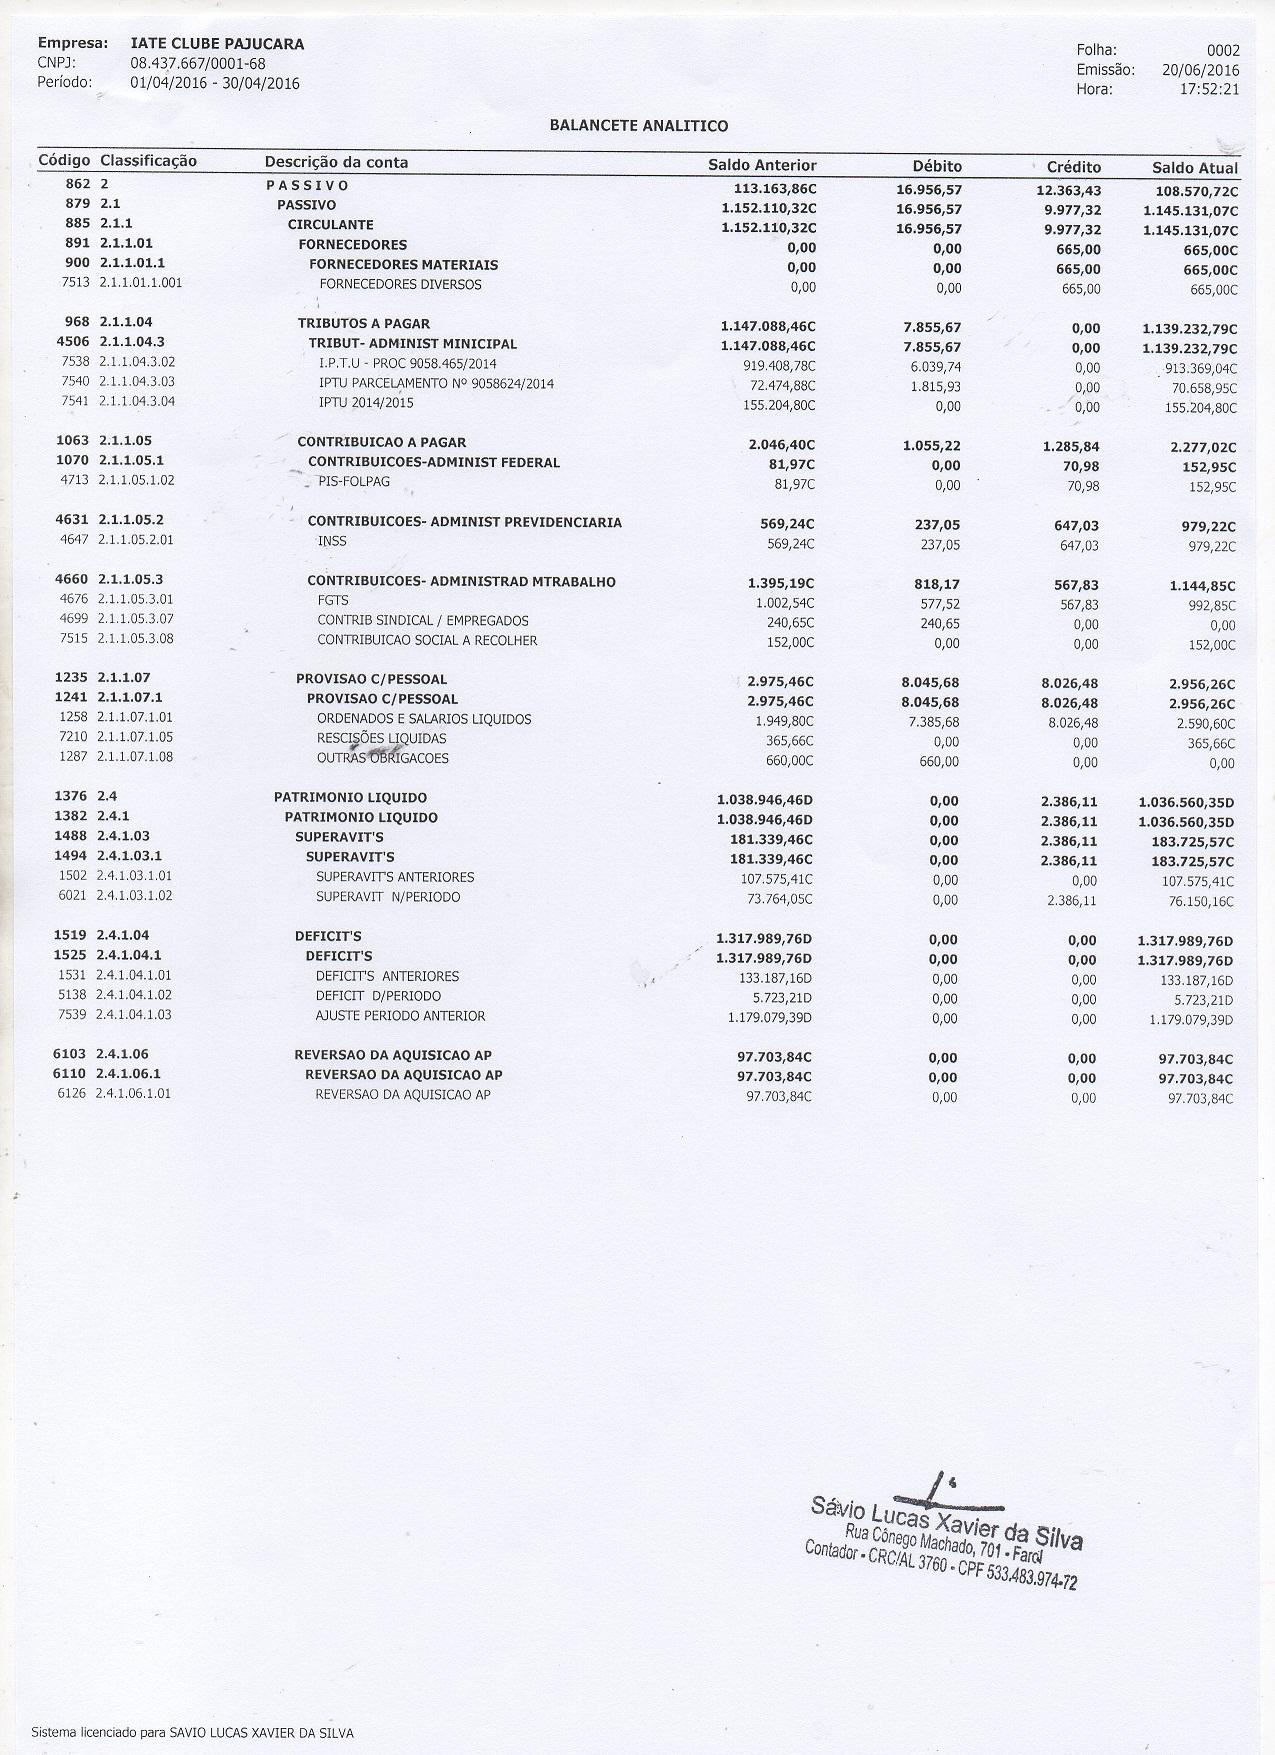 img609